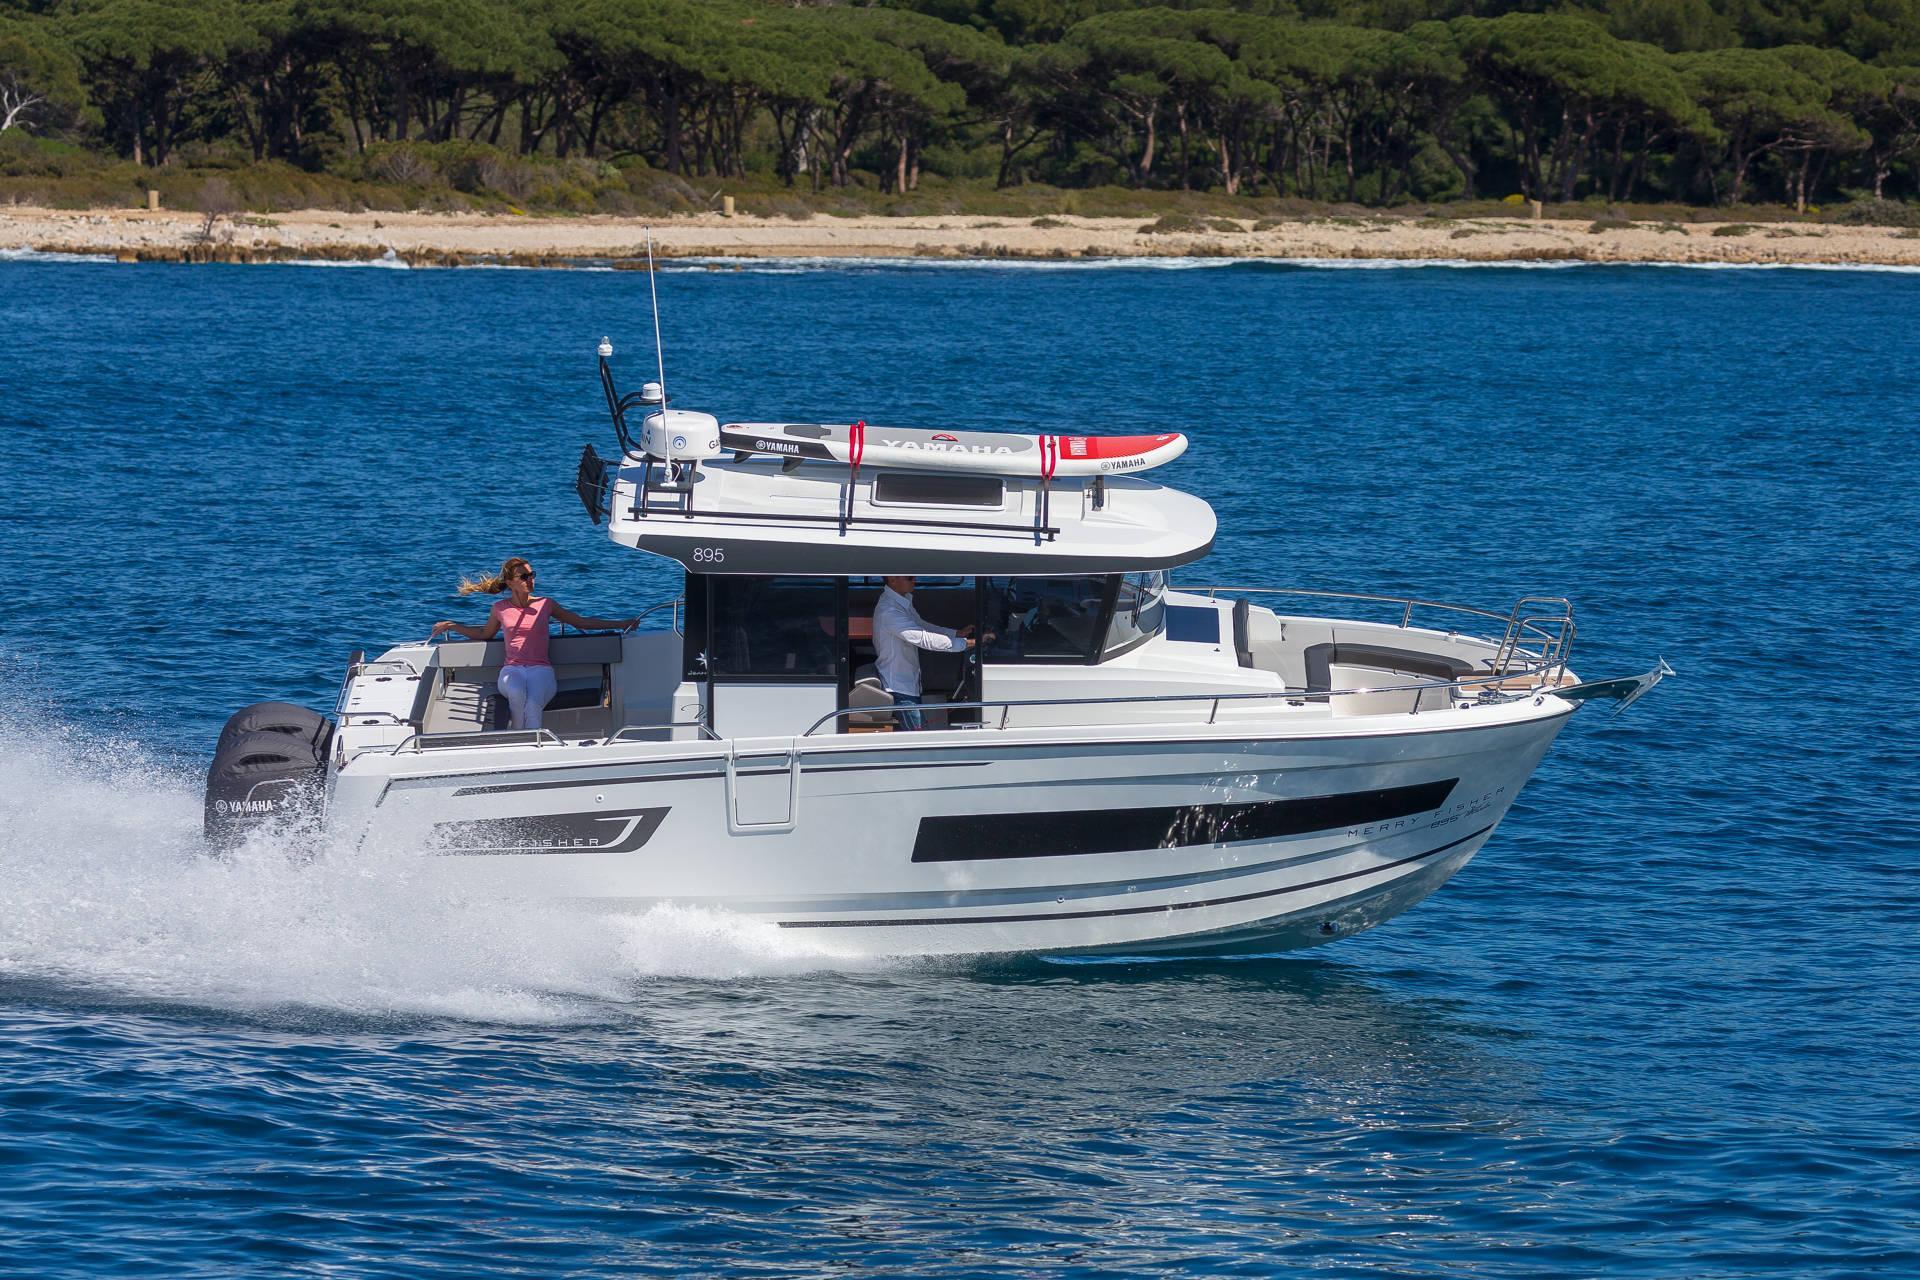 Barcos a motor_barcos de pesca